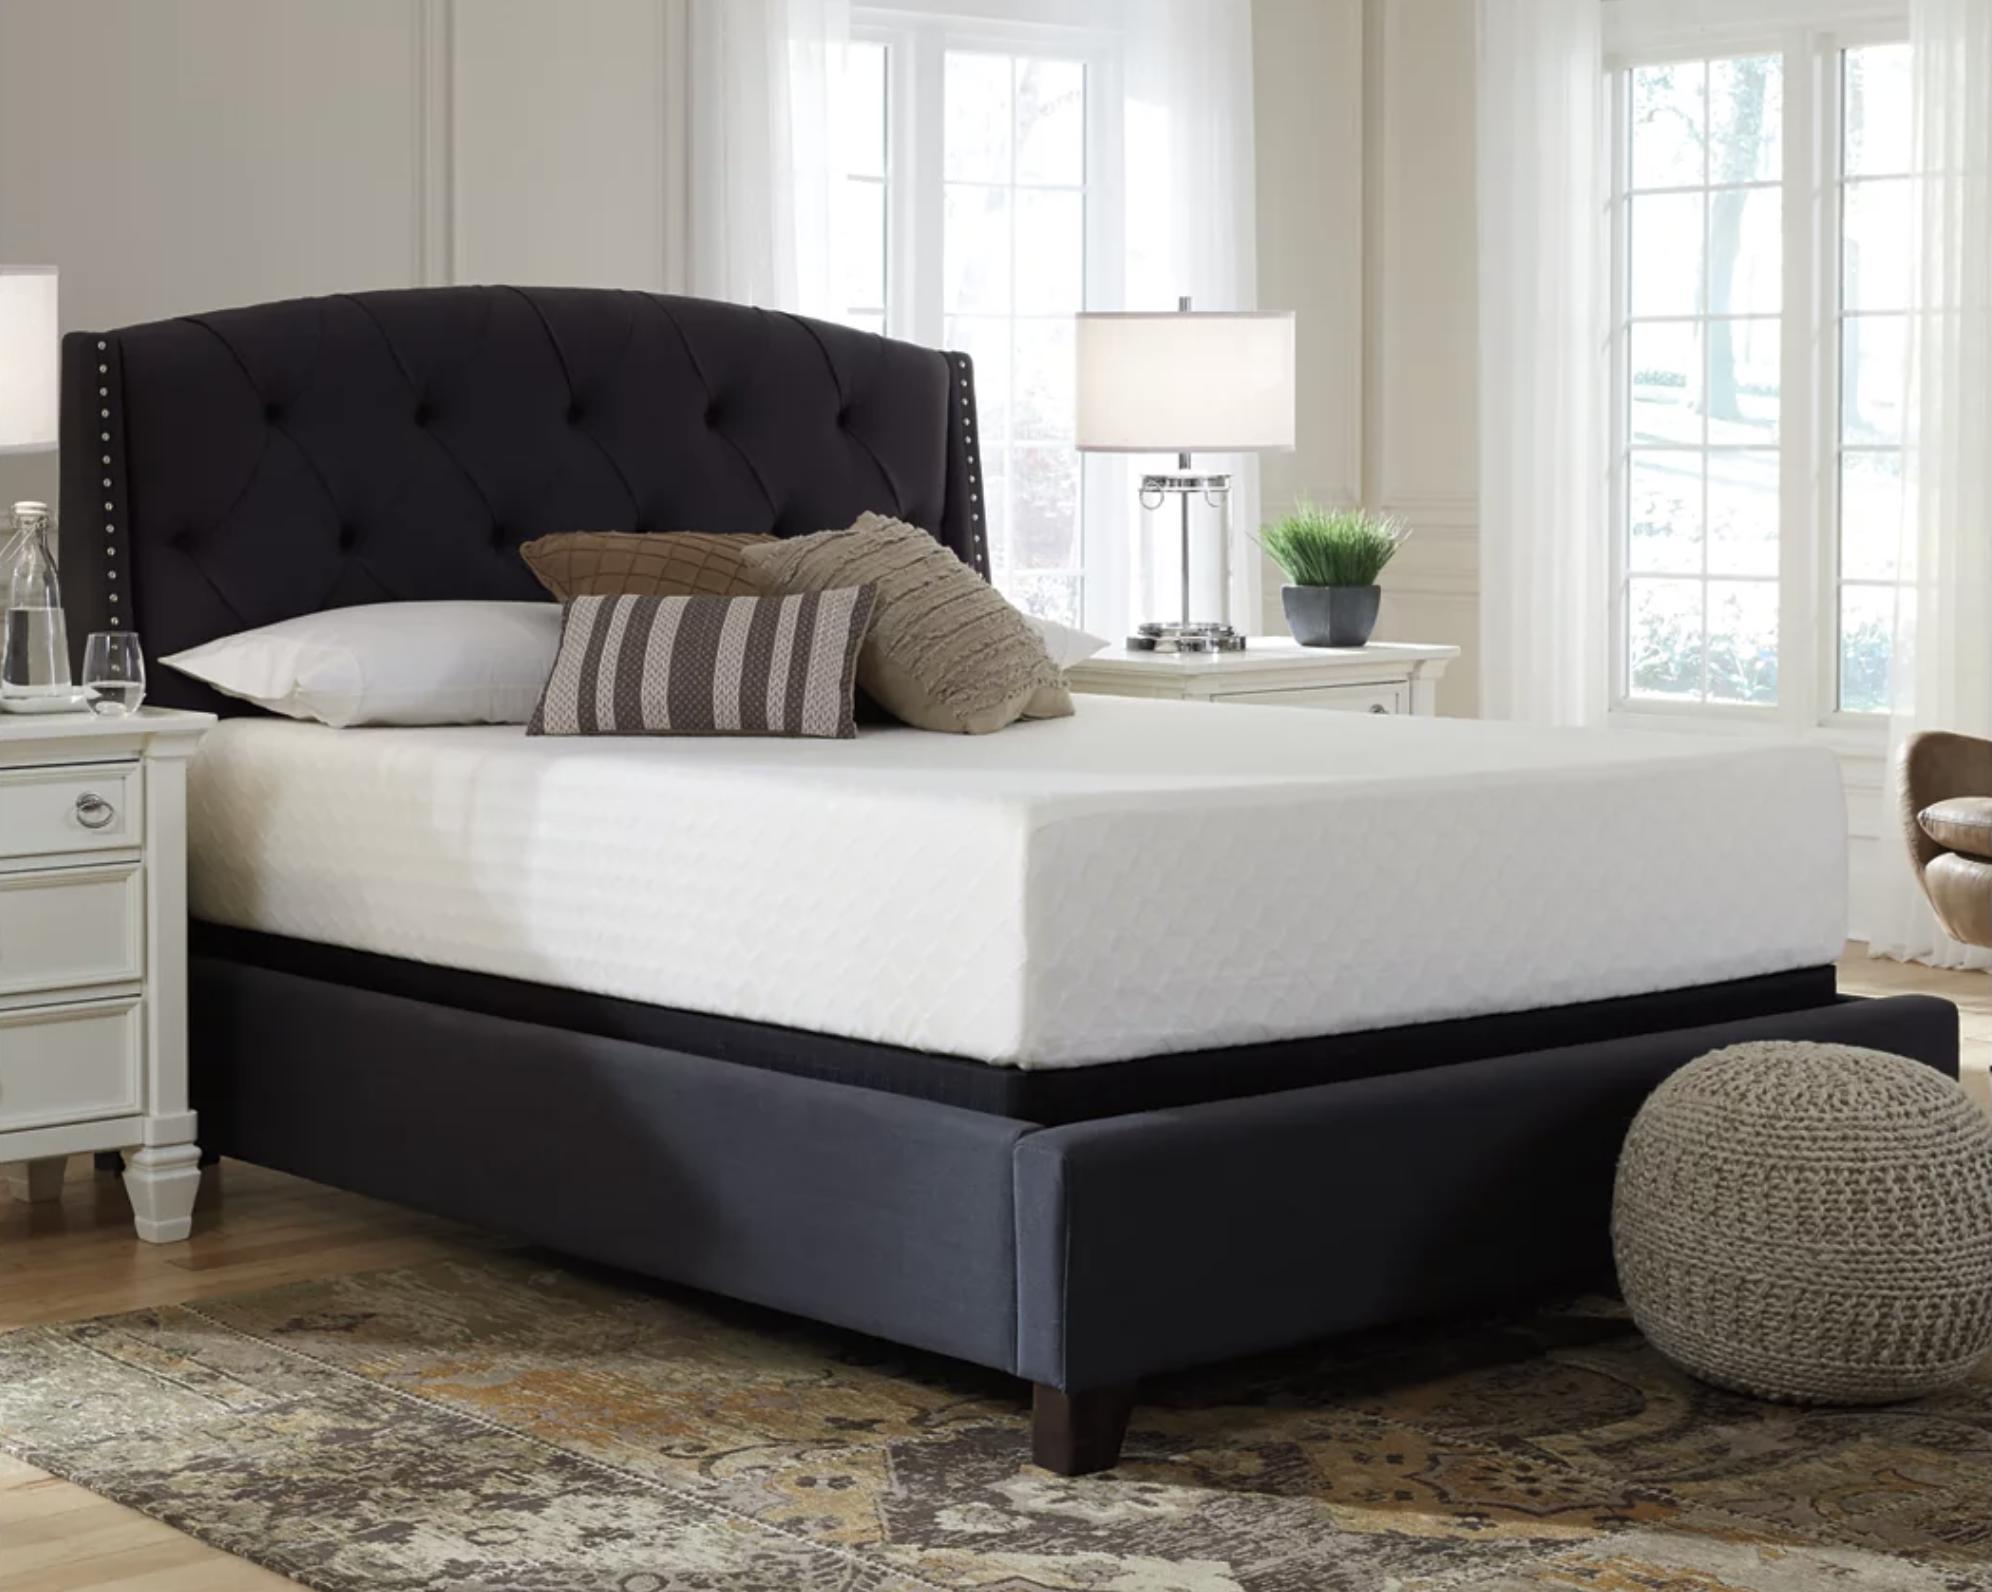 Best Ashley Furniture Black Friday Sales 2020 Ashley Furniture Cyber Monday Deals